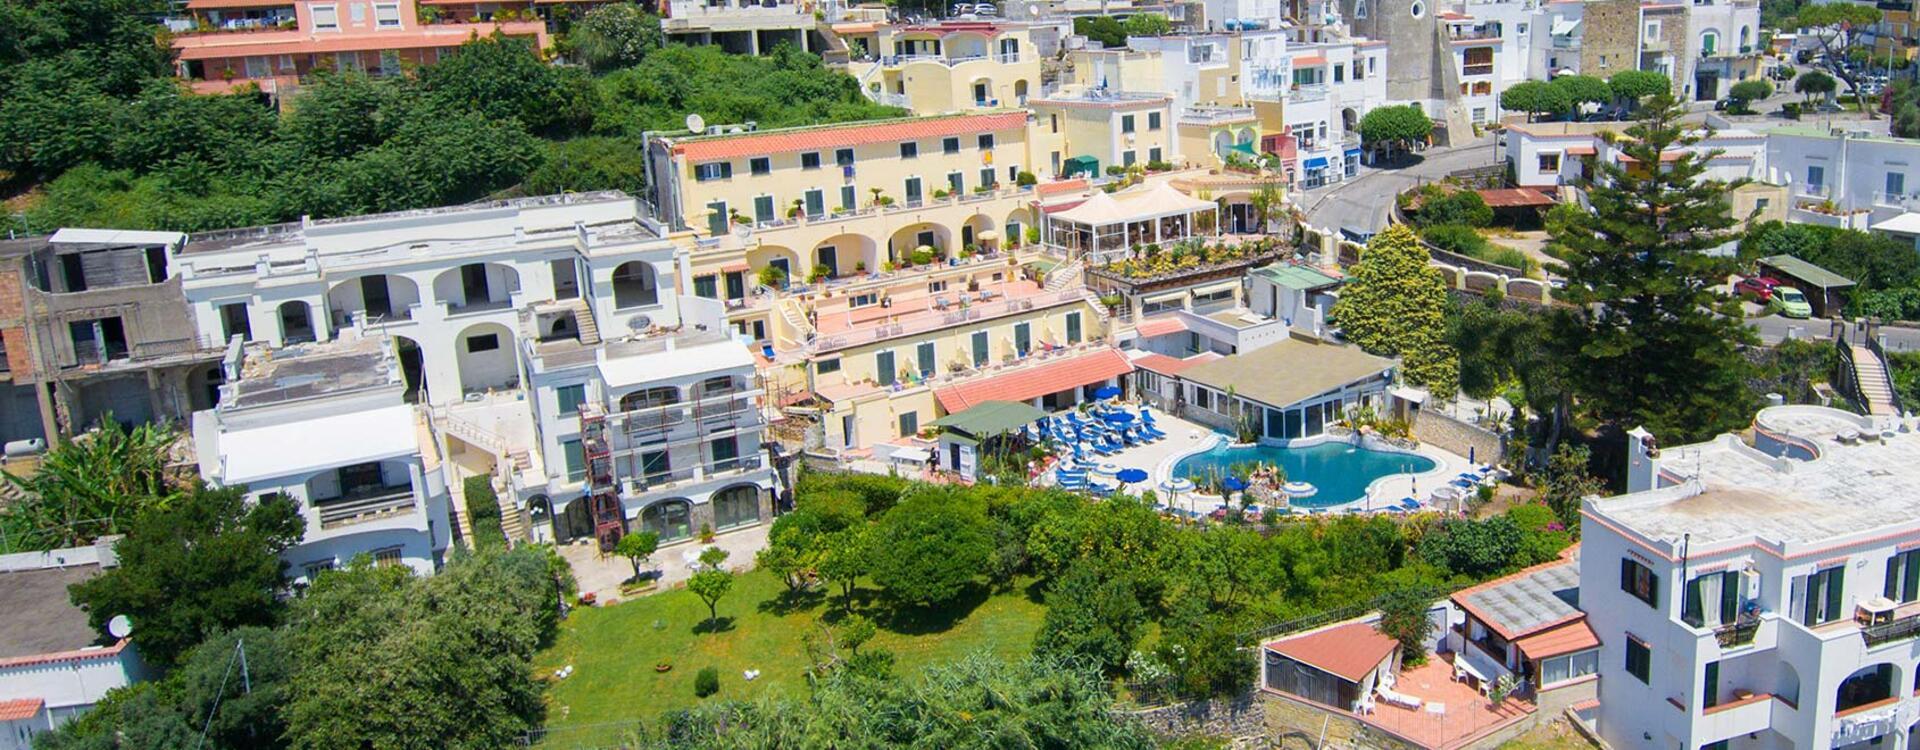 hotelsaintraphaelischia en where-we-are 010